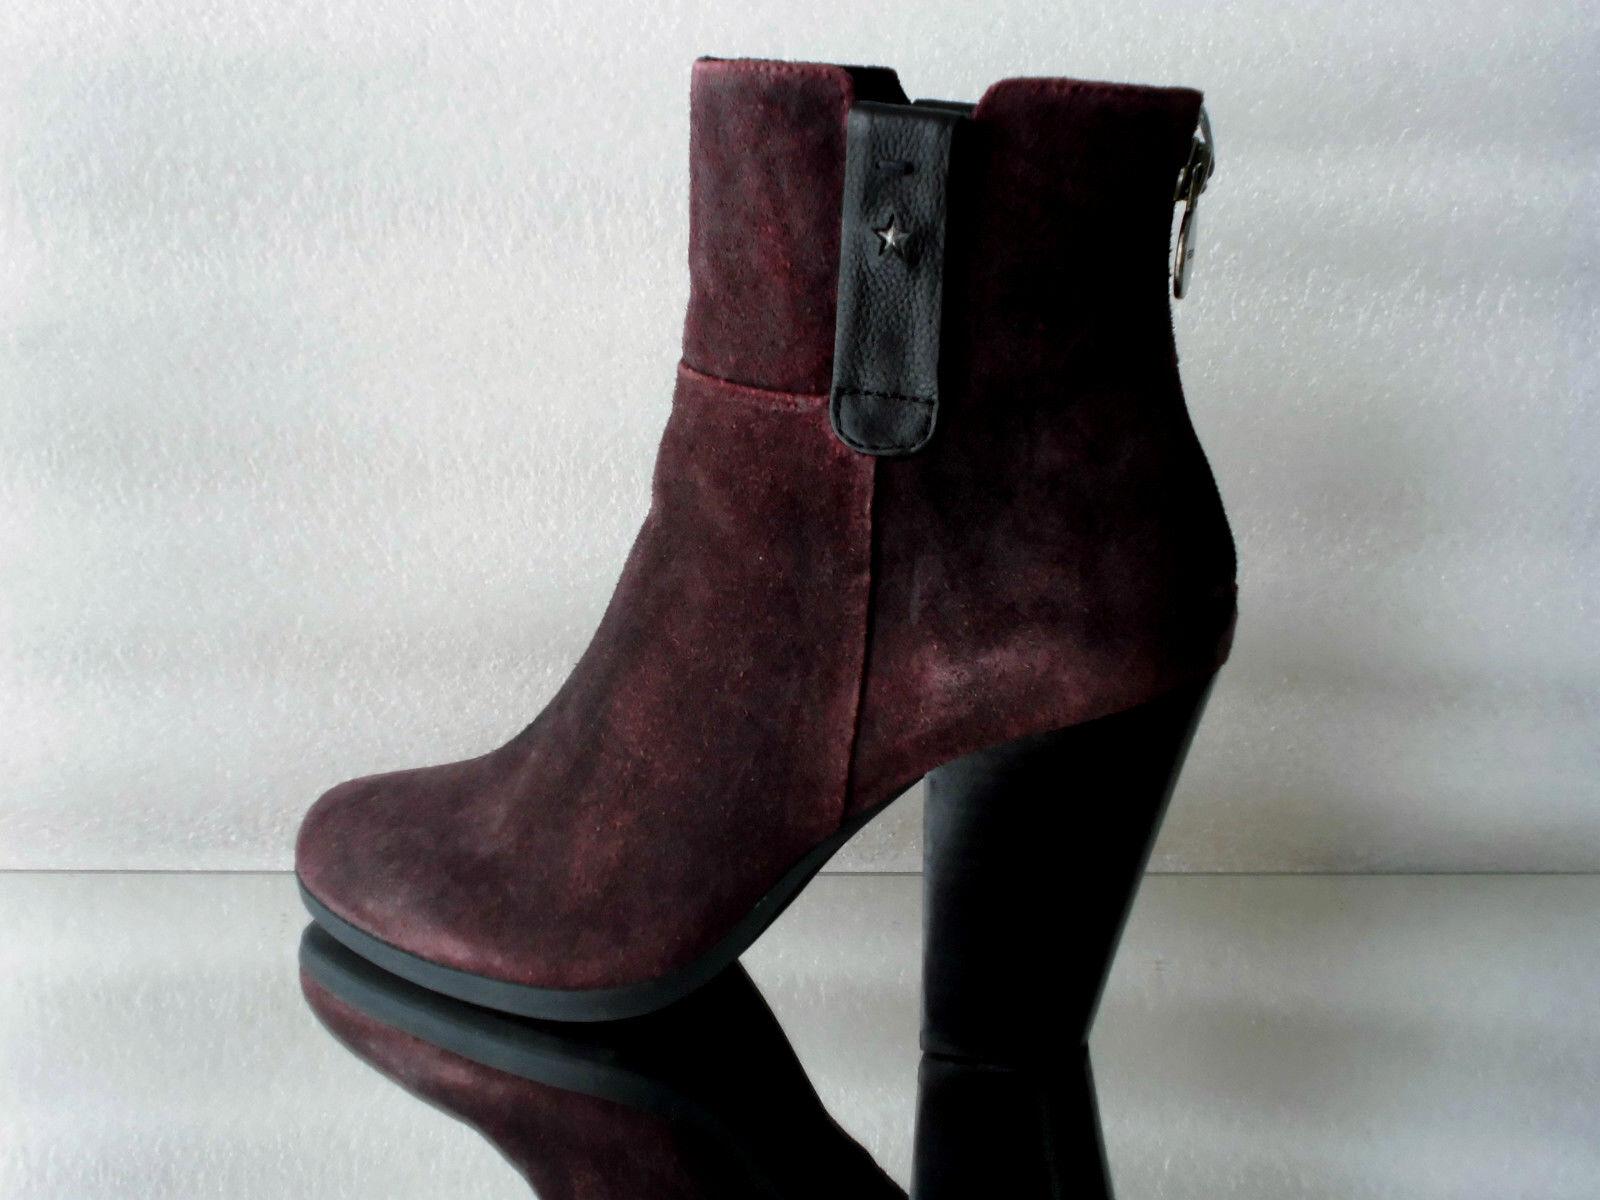 Zapatos especiales con descuento Damen Stiefeletten GEOX C7452 Farbe Skarlet Gr:36-40 Neu